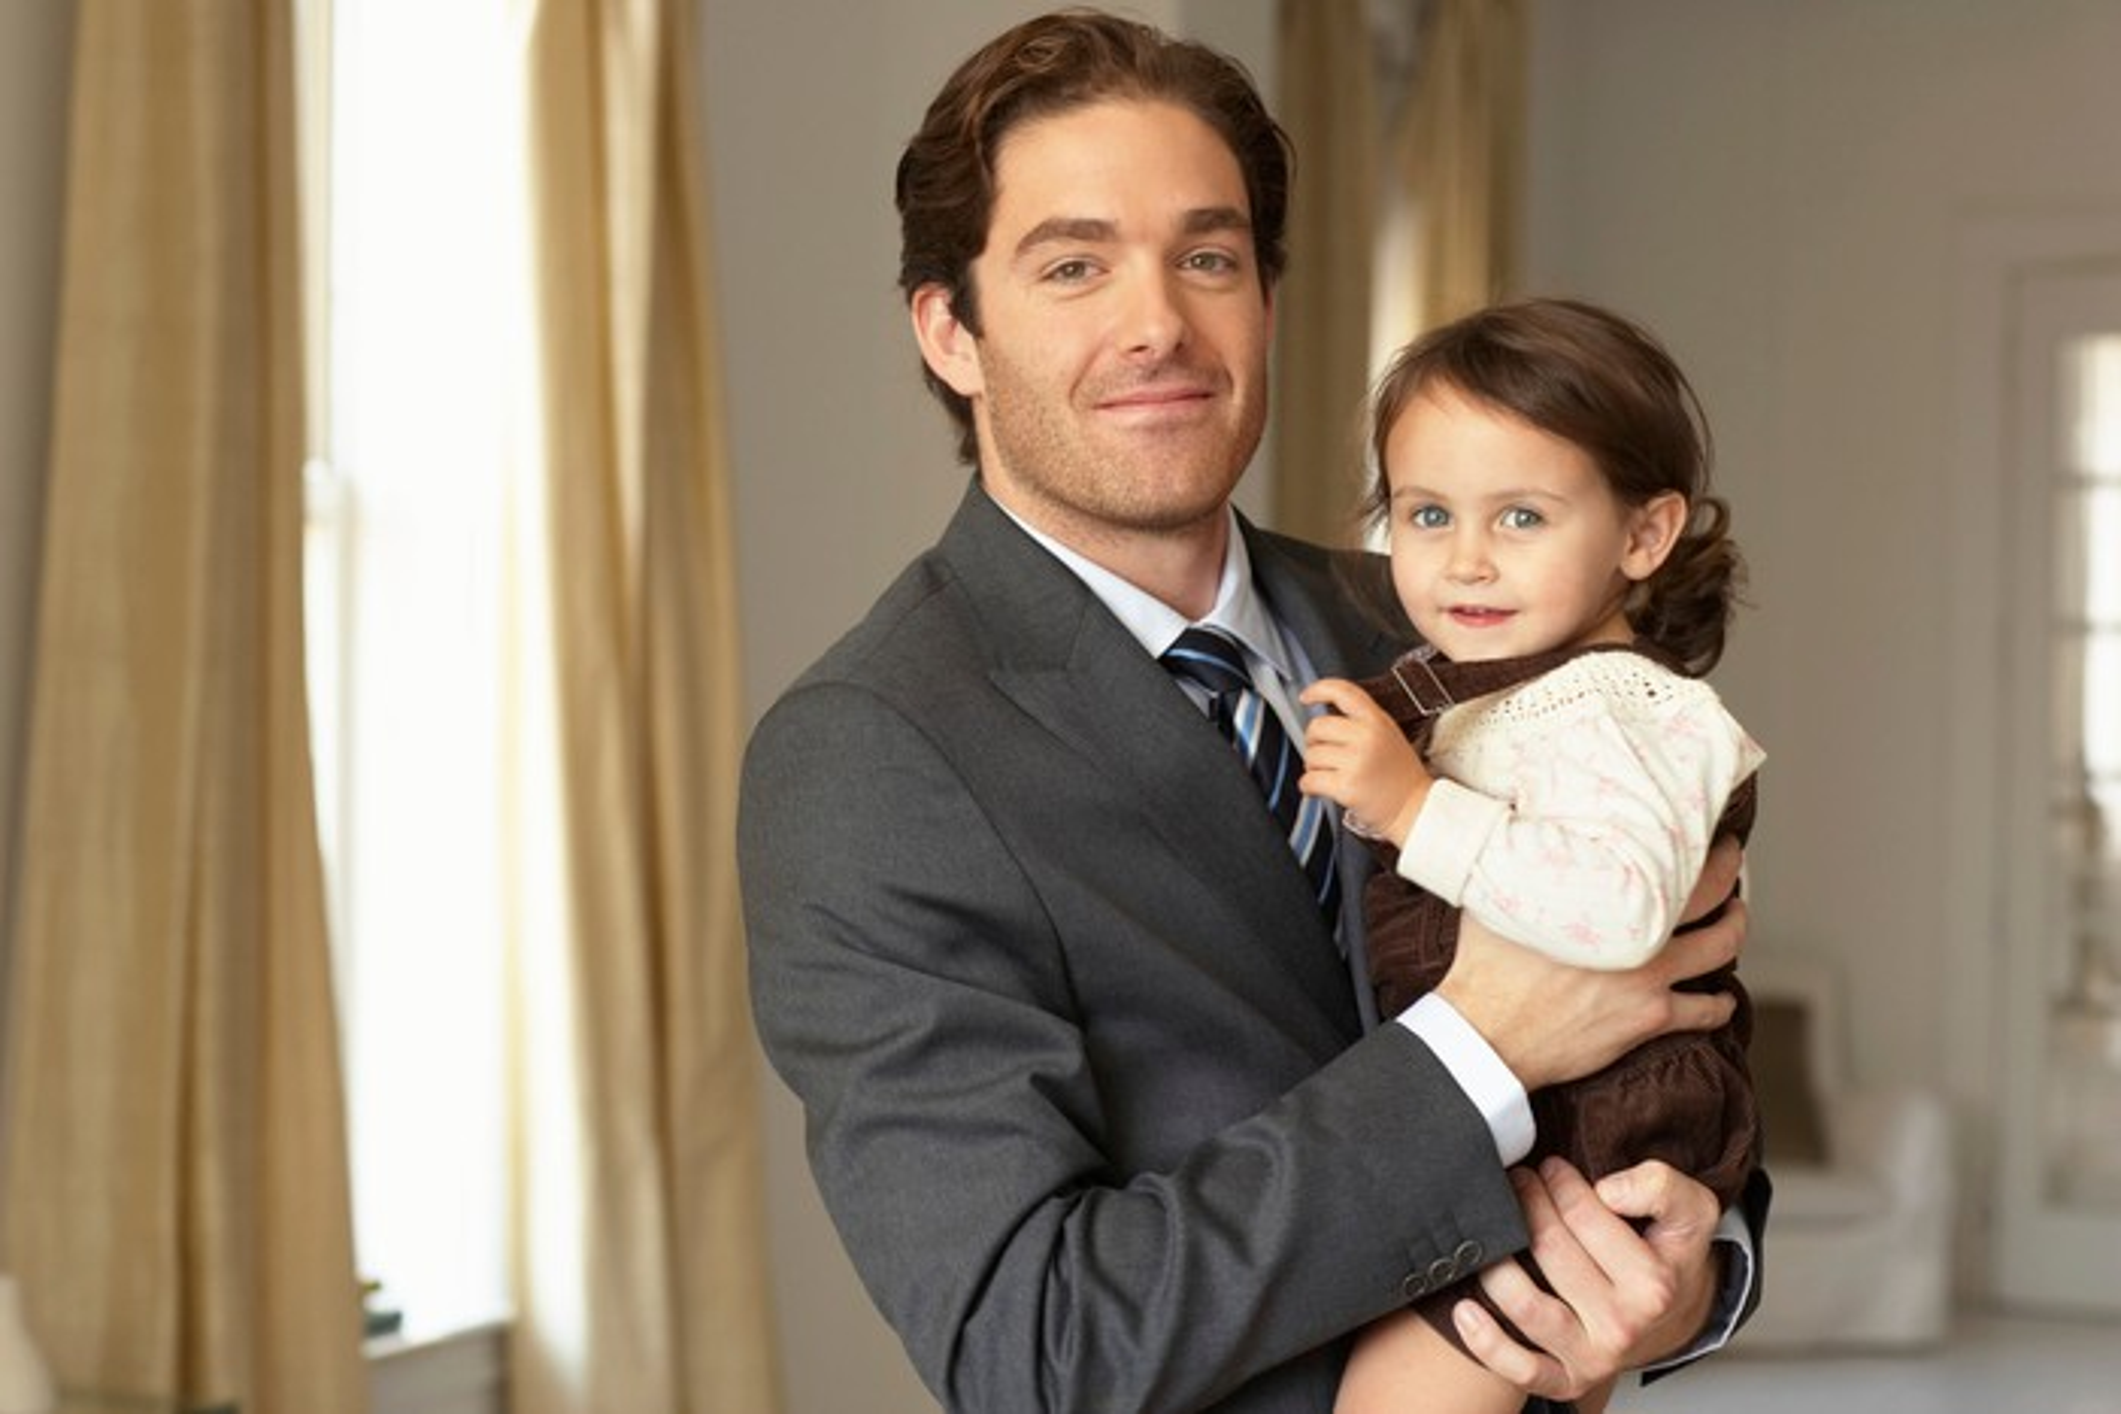 Professionally dressed man holding baby girl